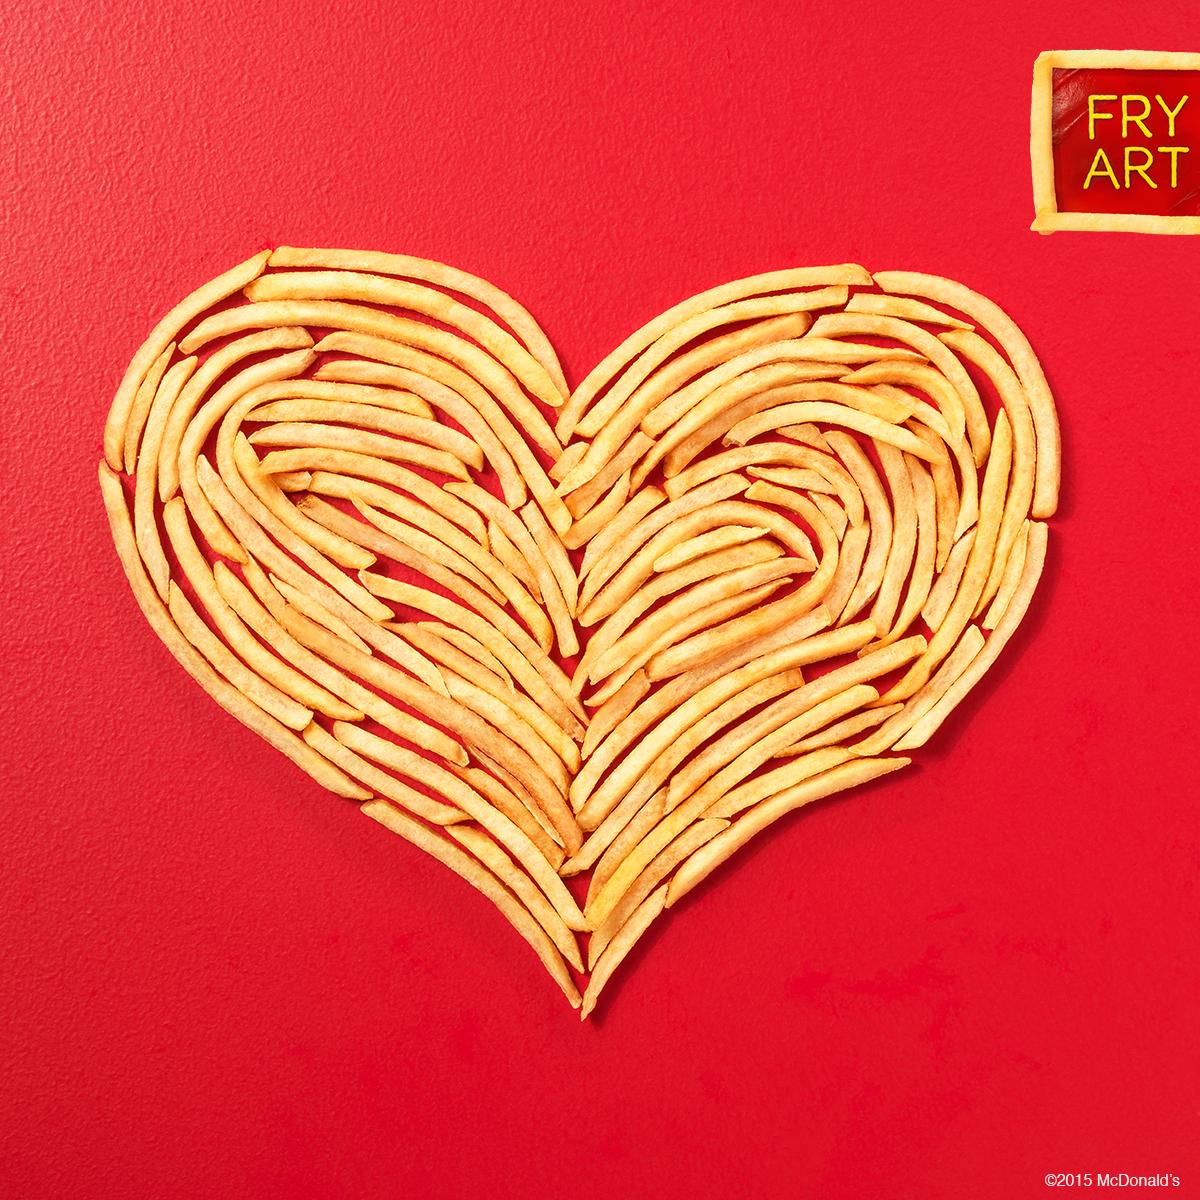 tri15018_FryArt-Heart_0163_lockup_13052015